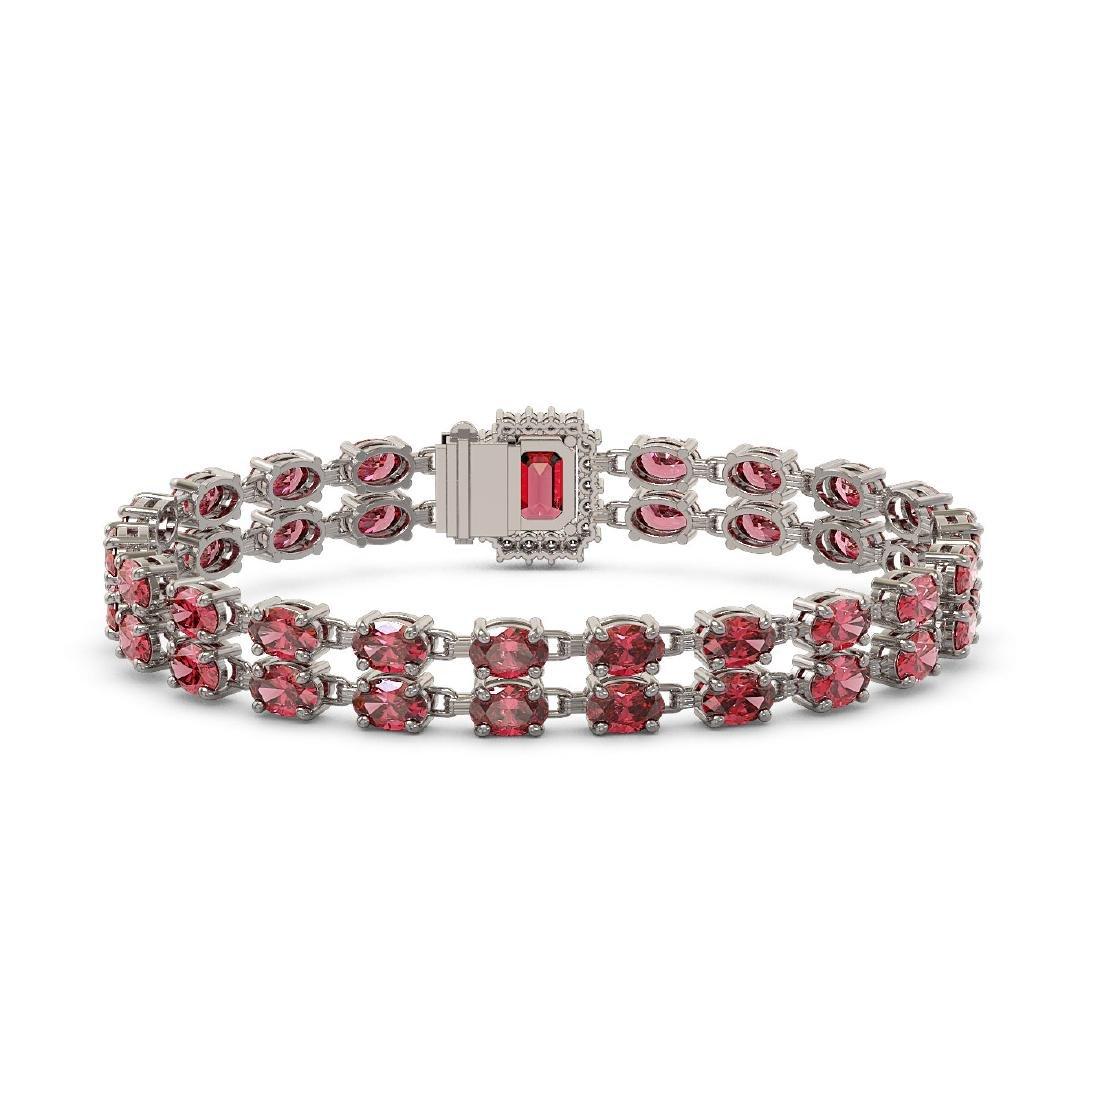 16.97 ctw Tourmaline & Diamond Bracelet 14K White Gold - 3